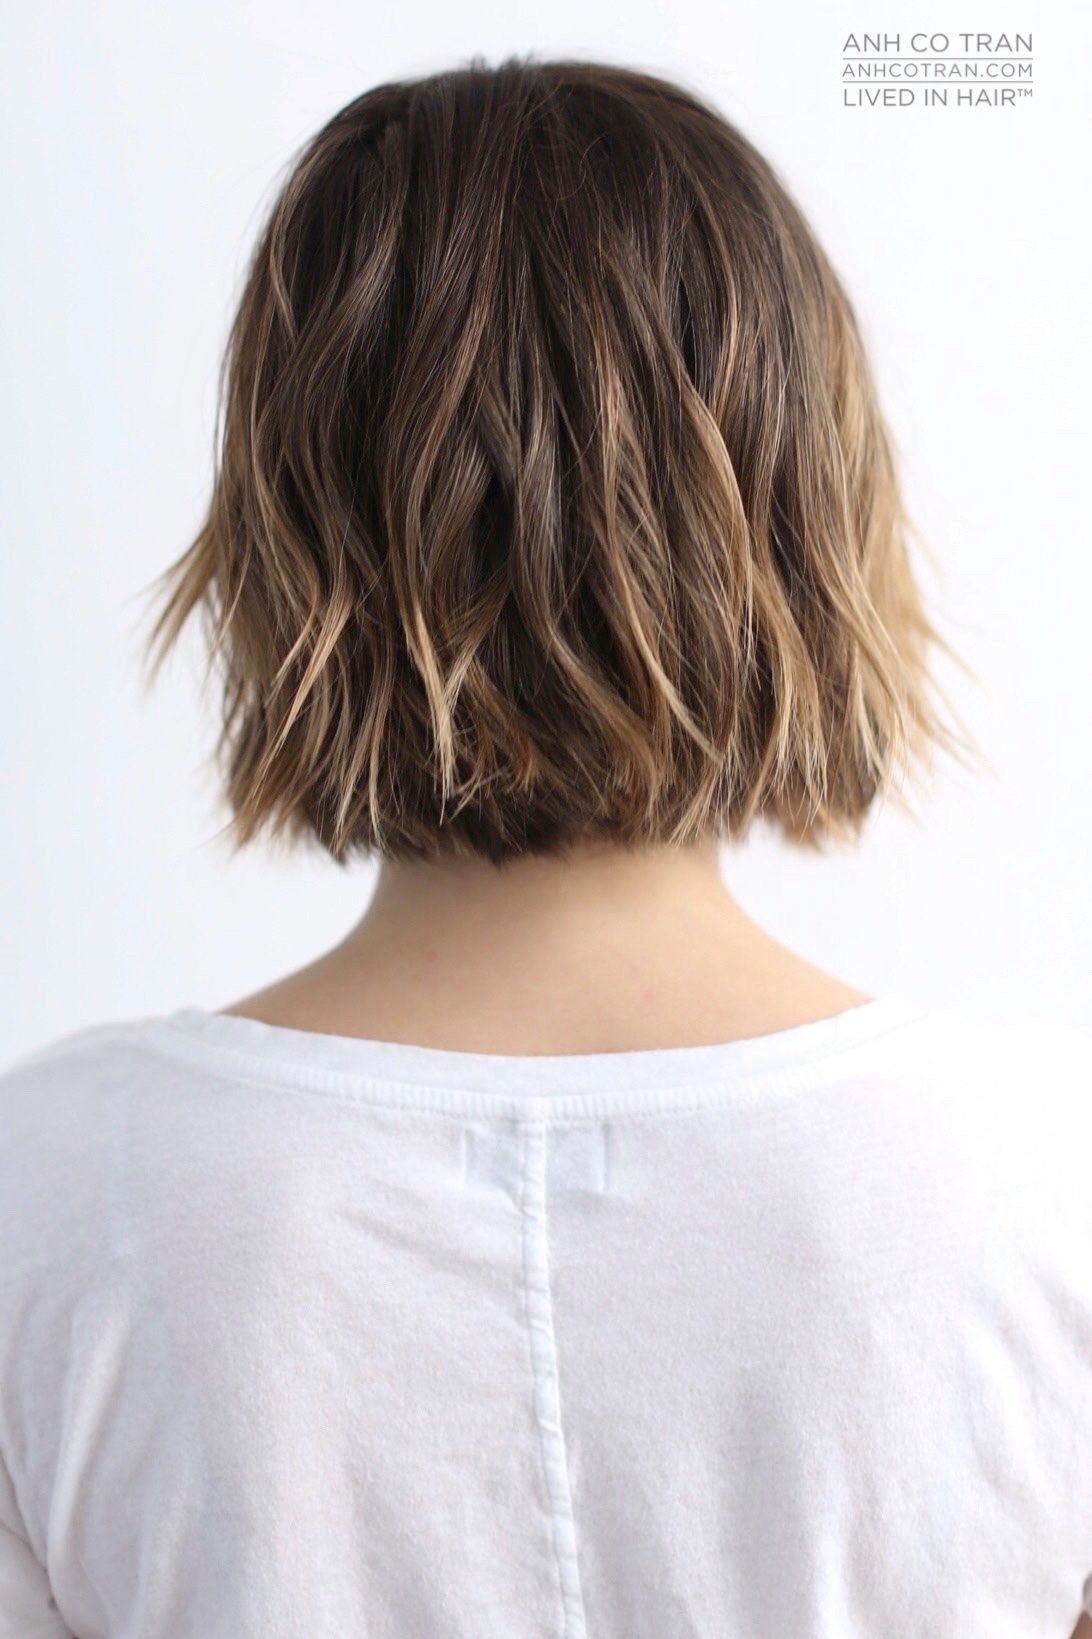 Pin by elle van cott on hair pinterest sophia bush appointments